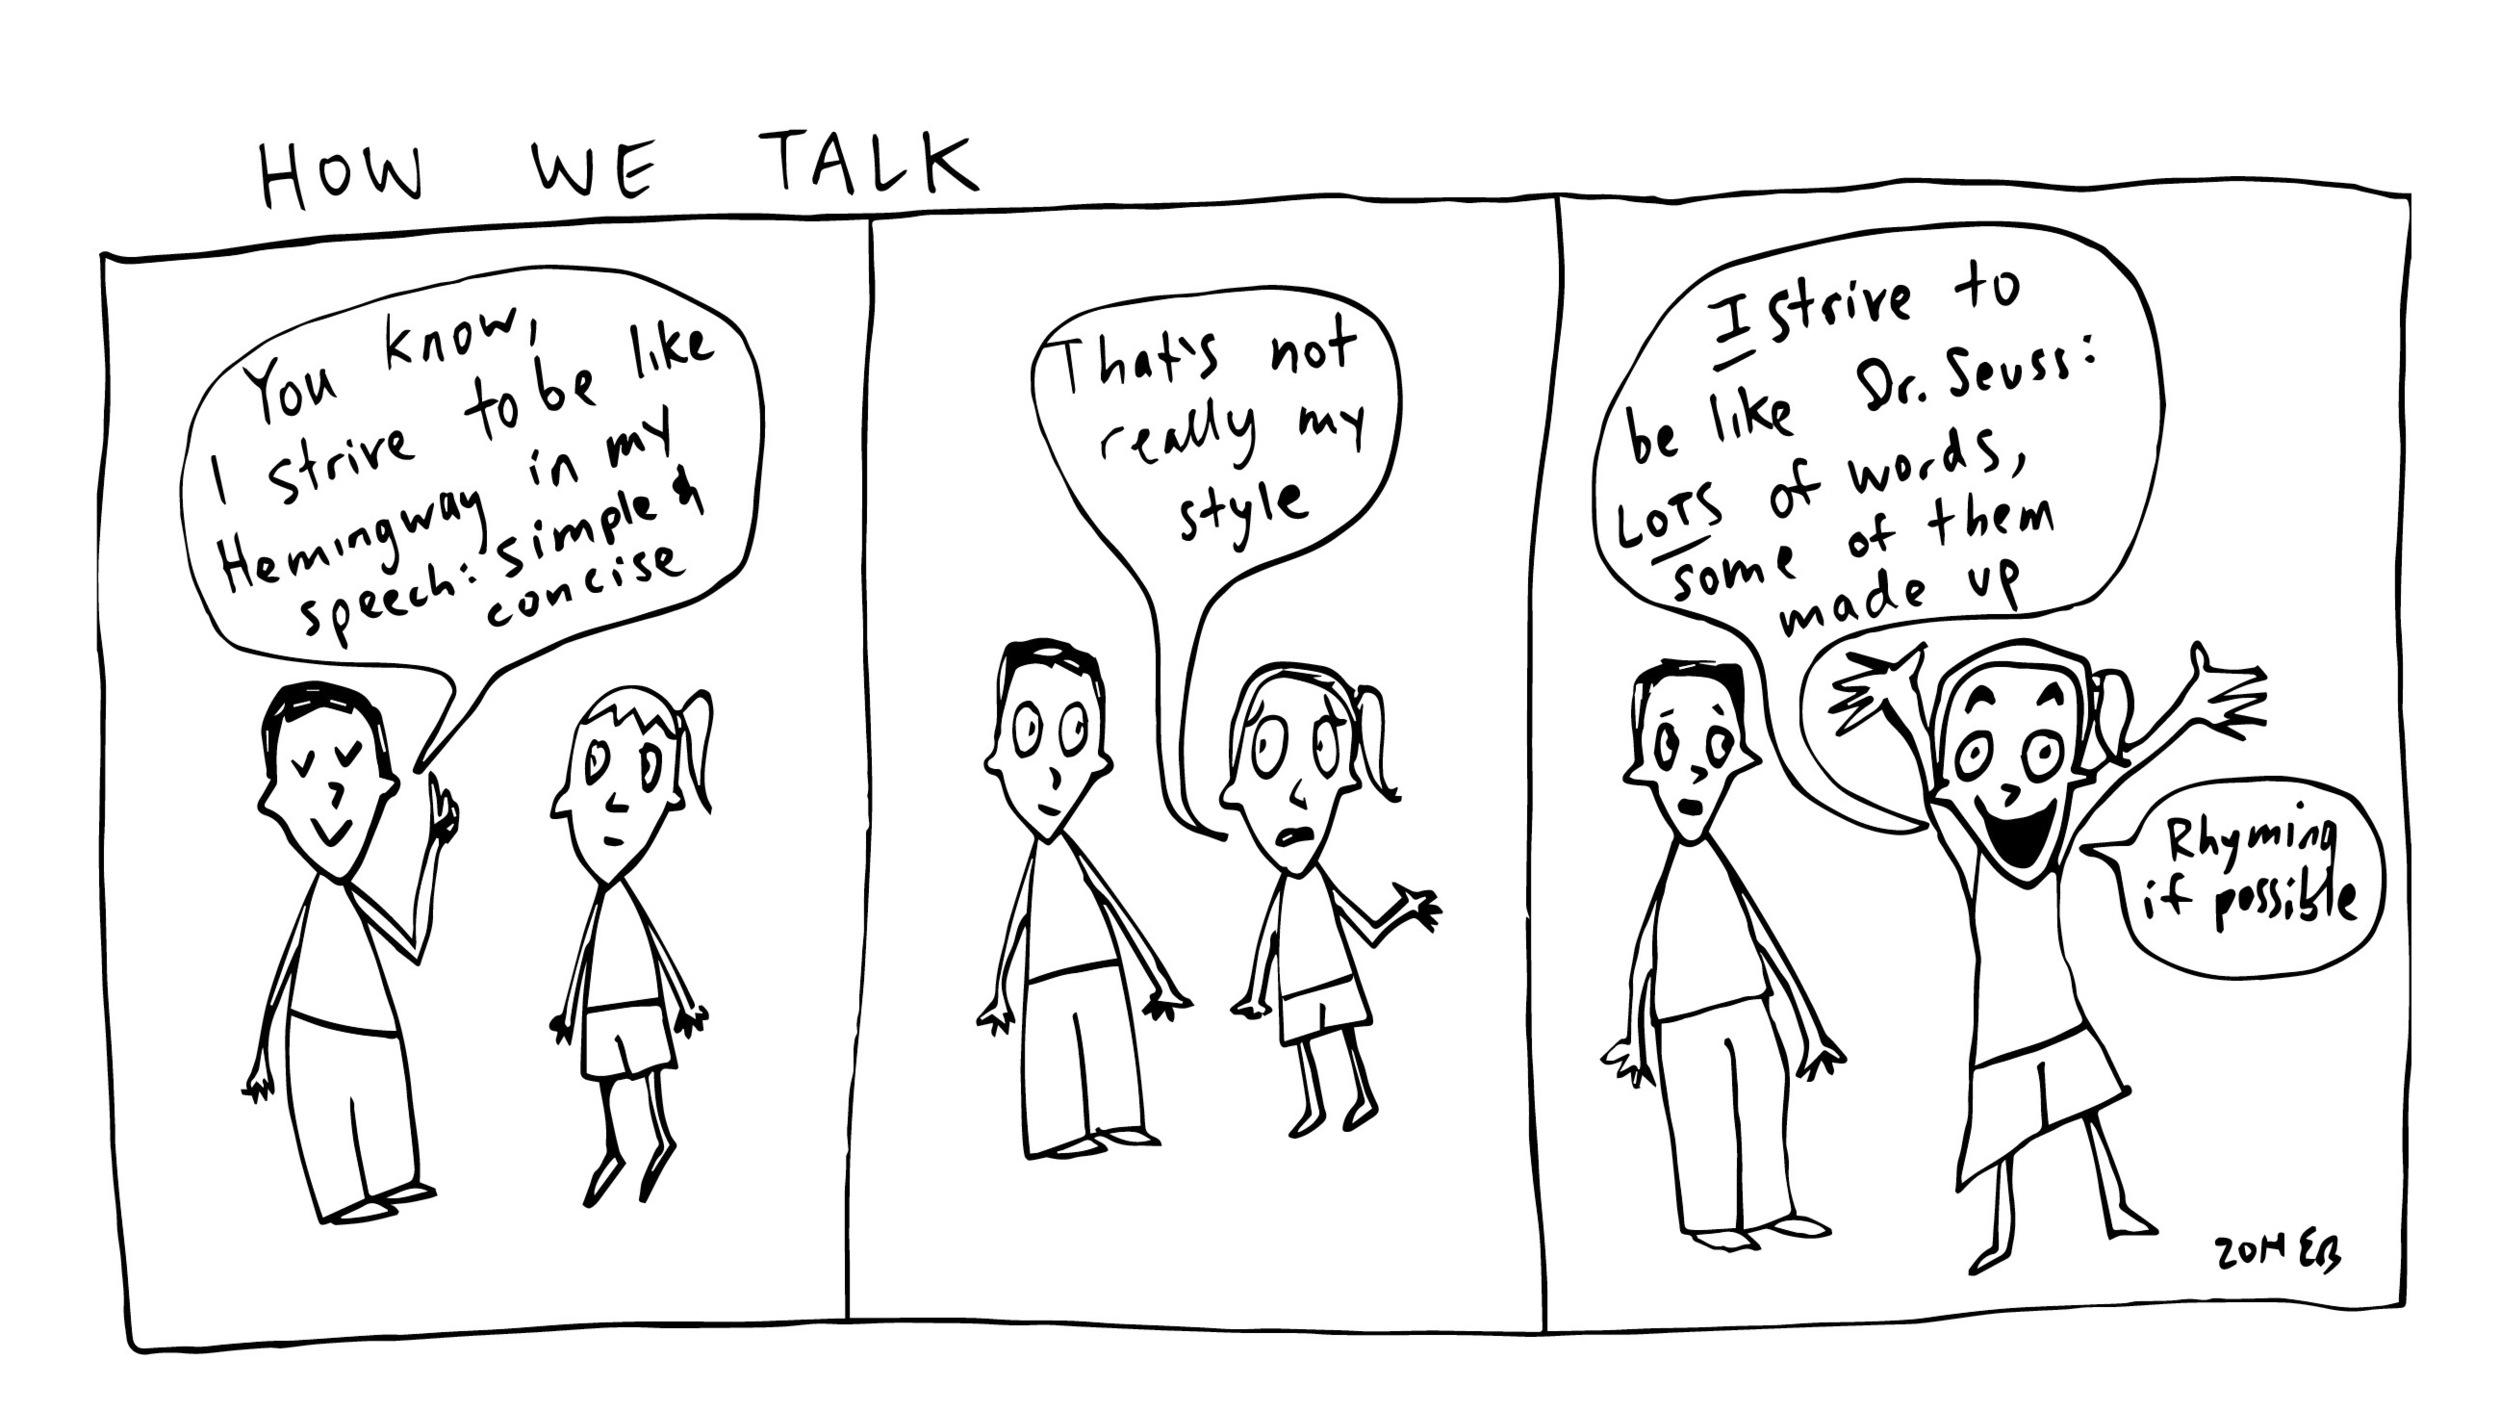 how we talk2.JPG